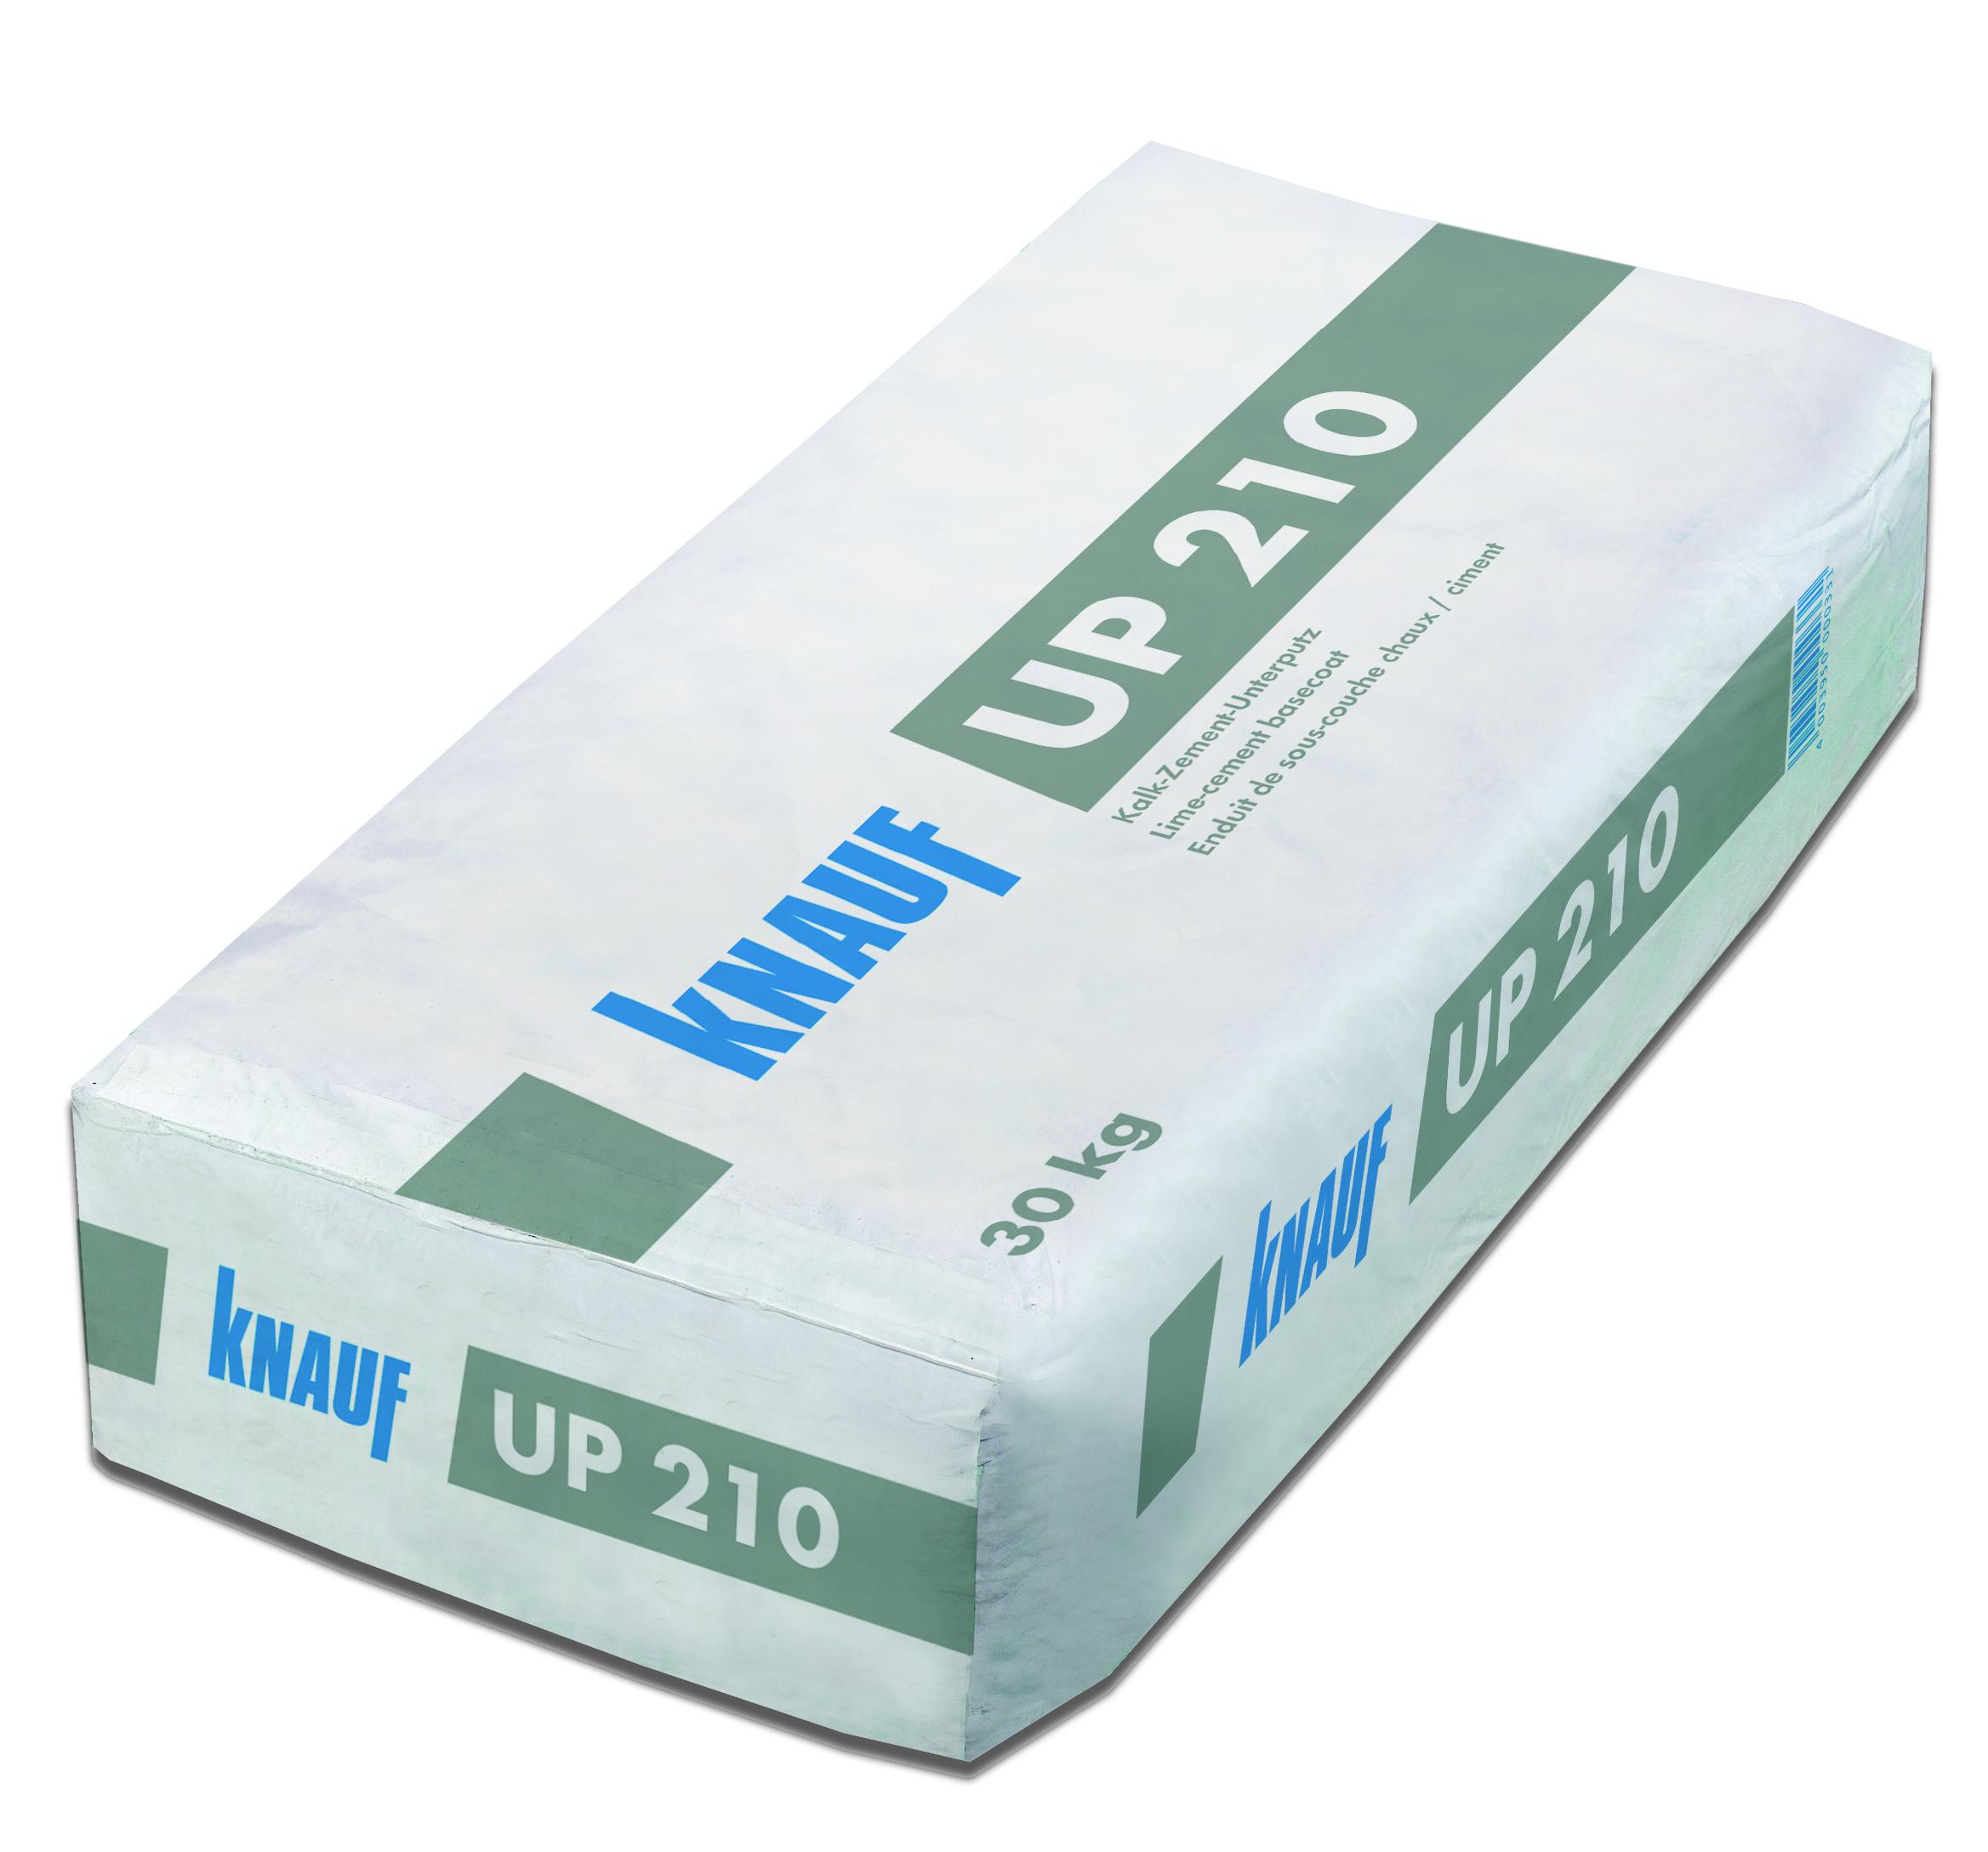 UP 210